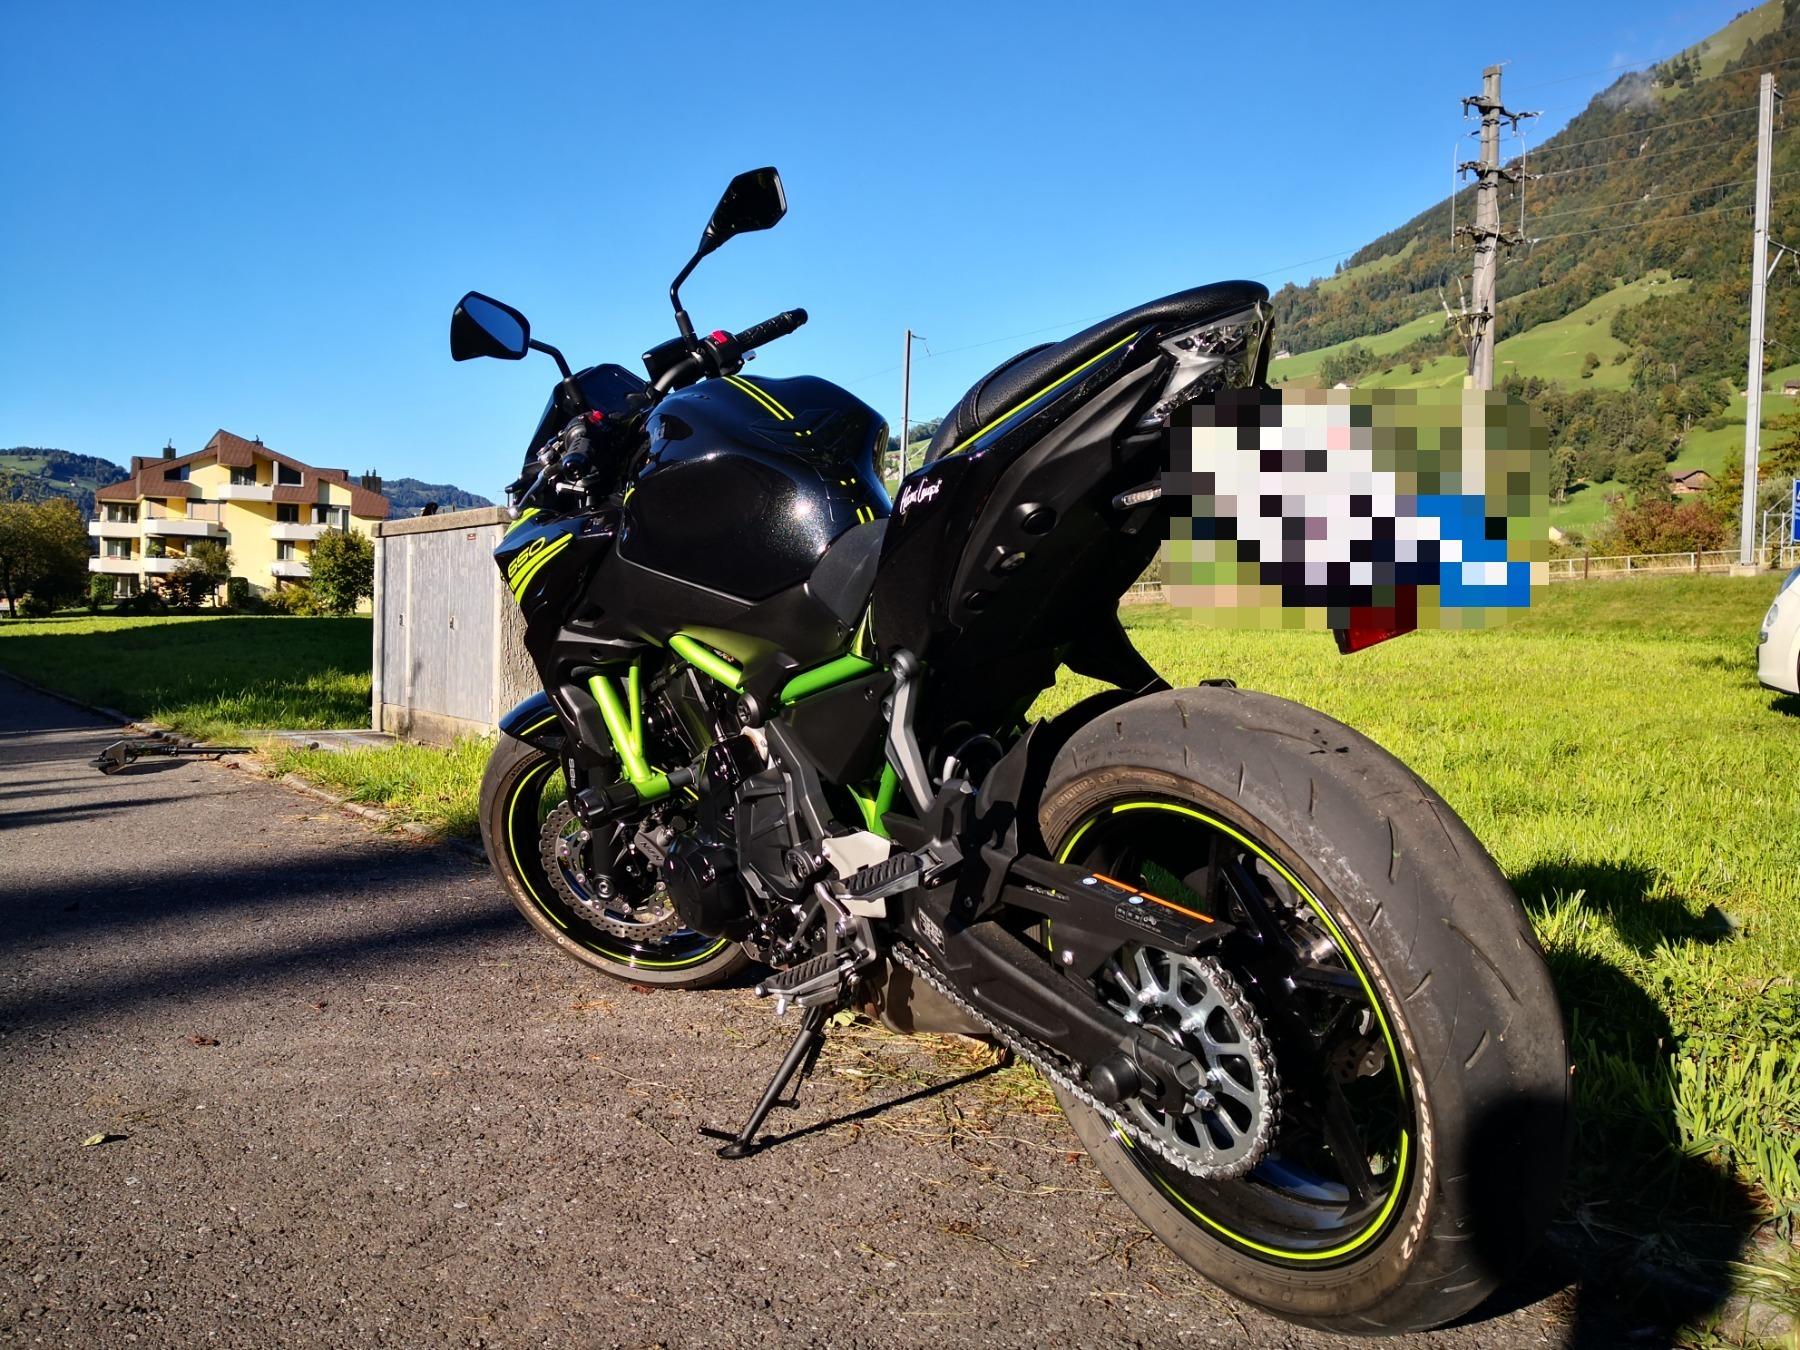 Kawasaki Z900 (35 KW) - Motorrad Mieten in der Schweiz